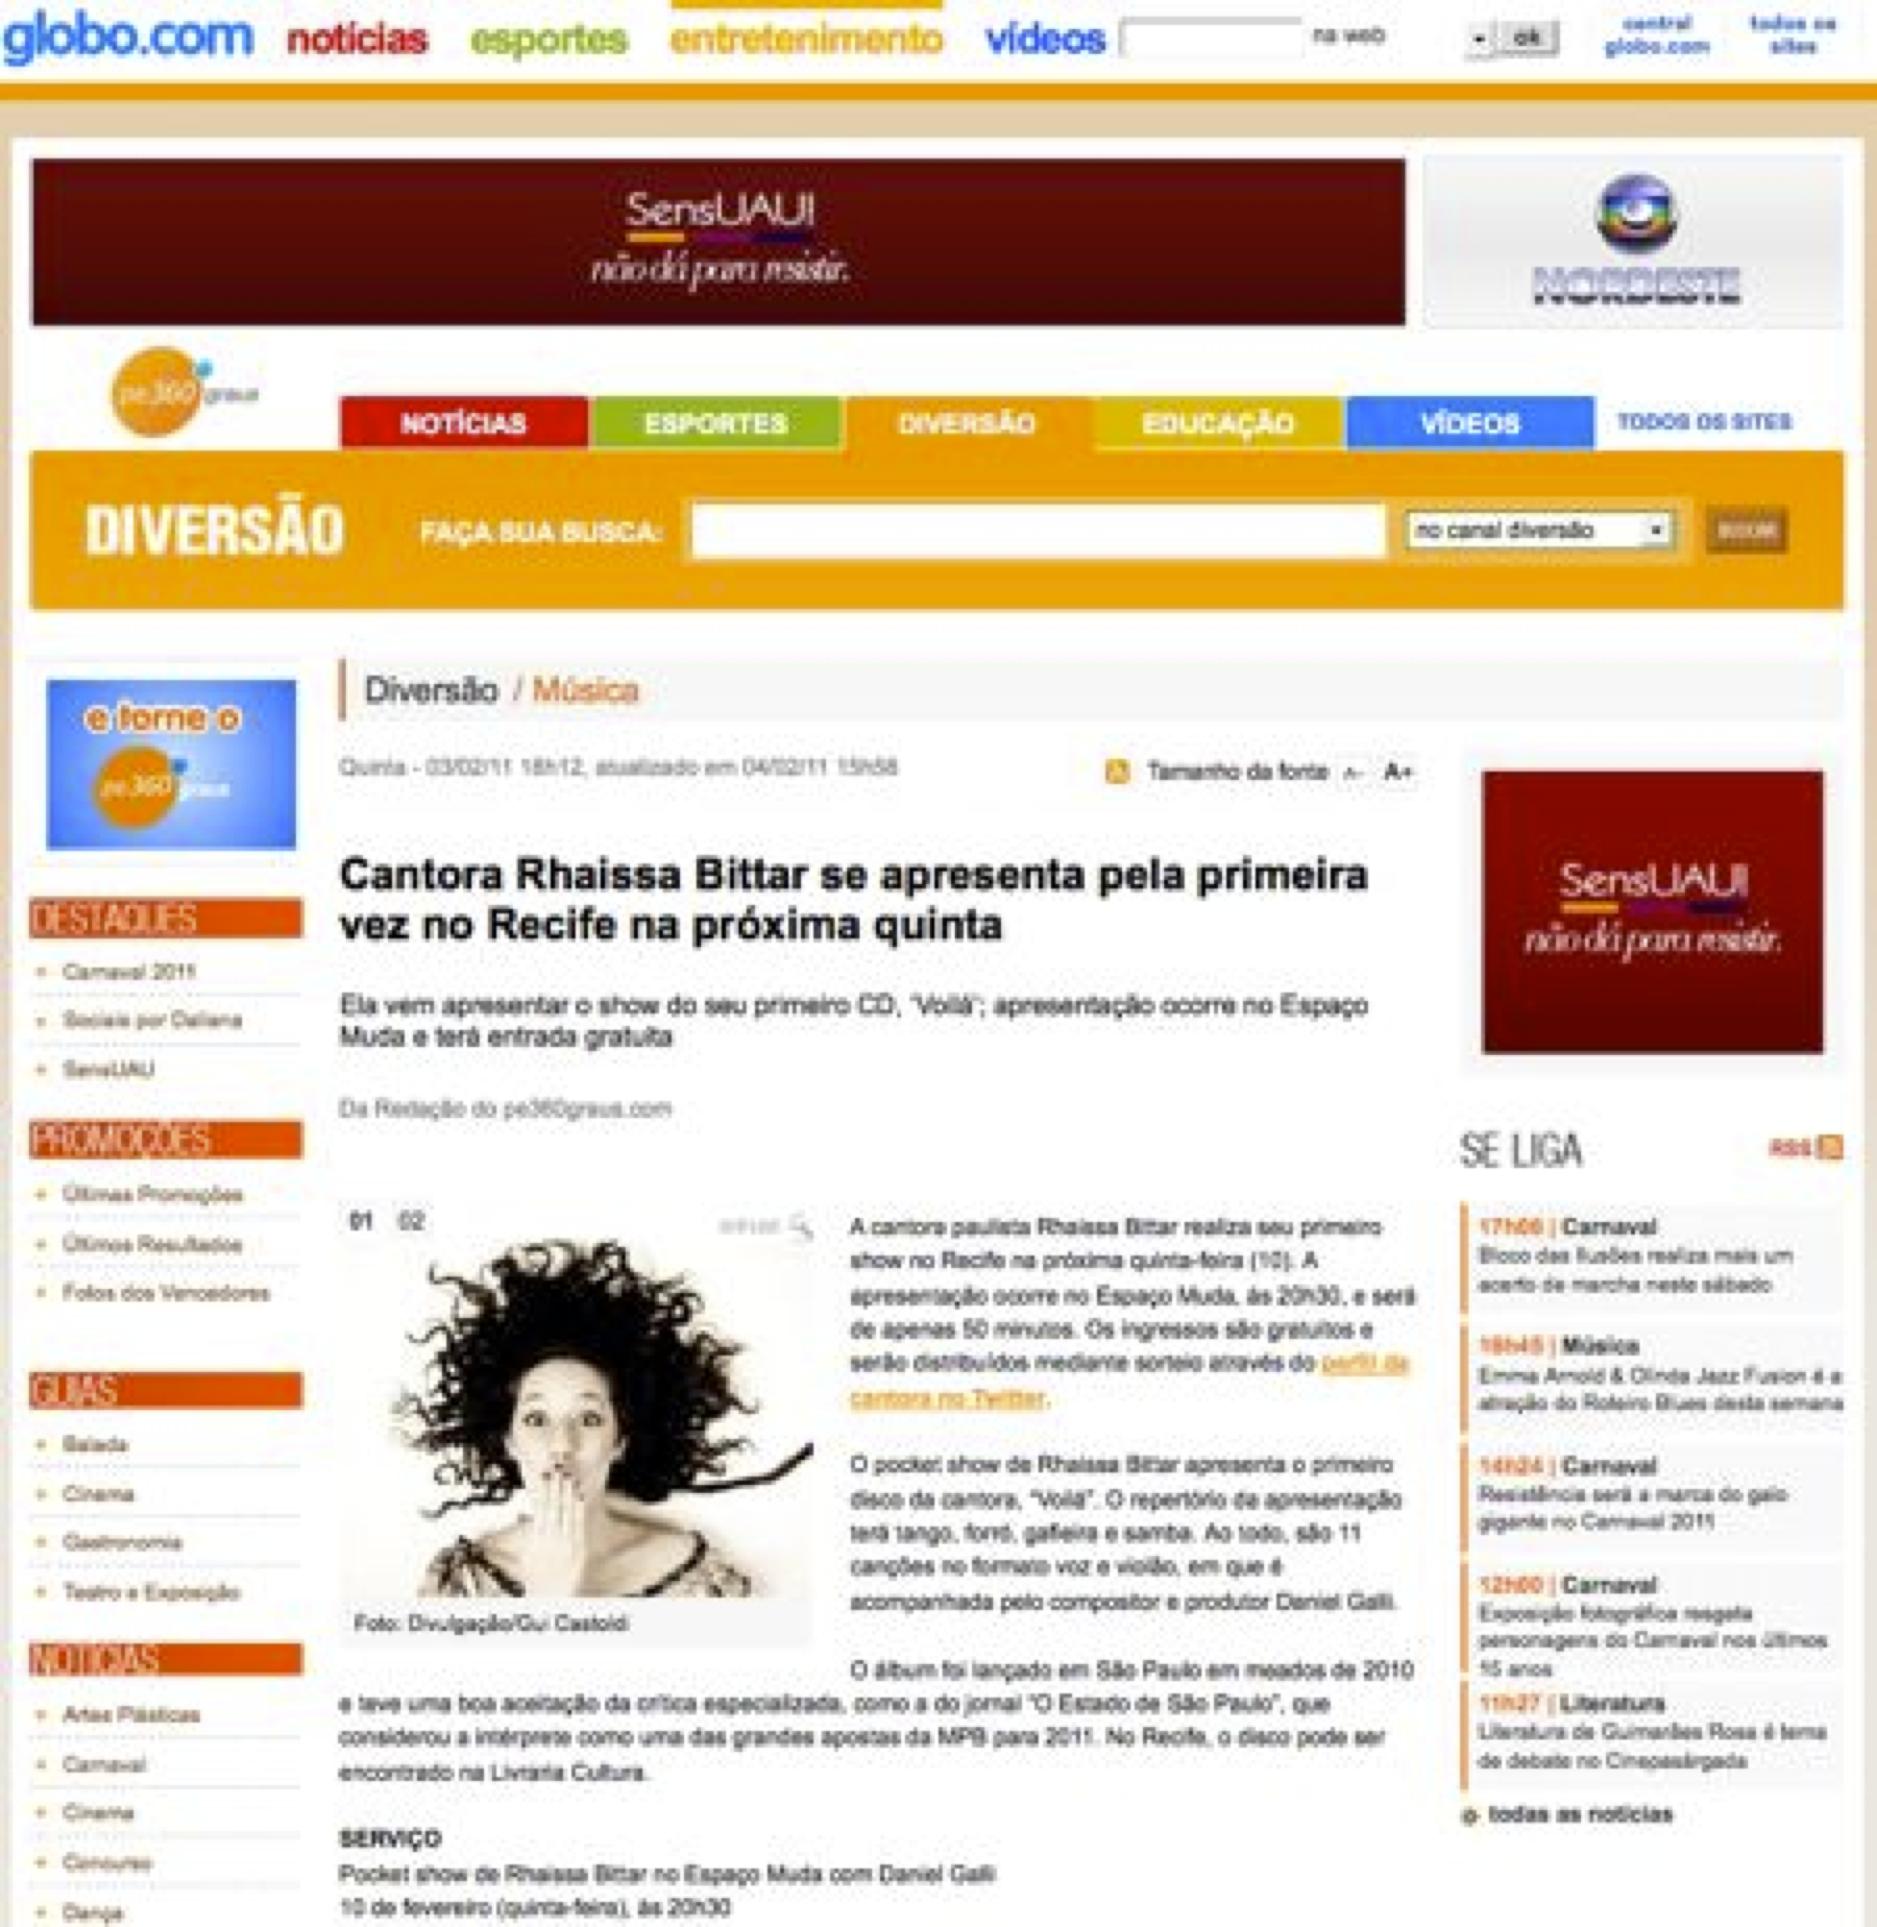 2012 - Globo.com